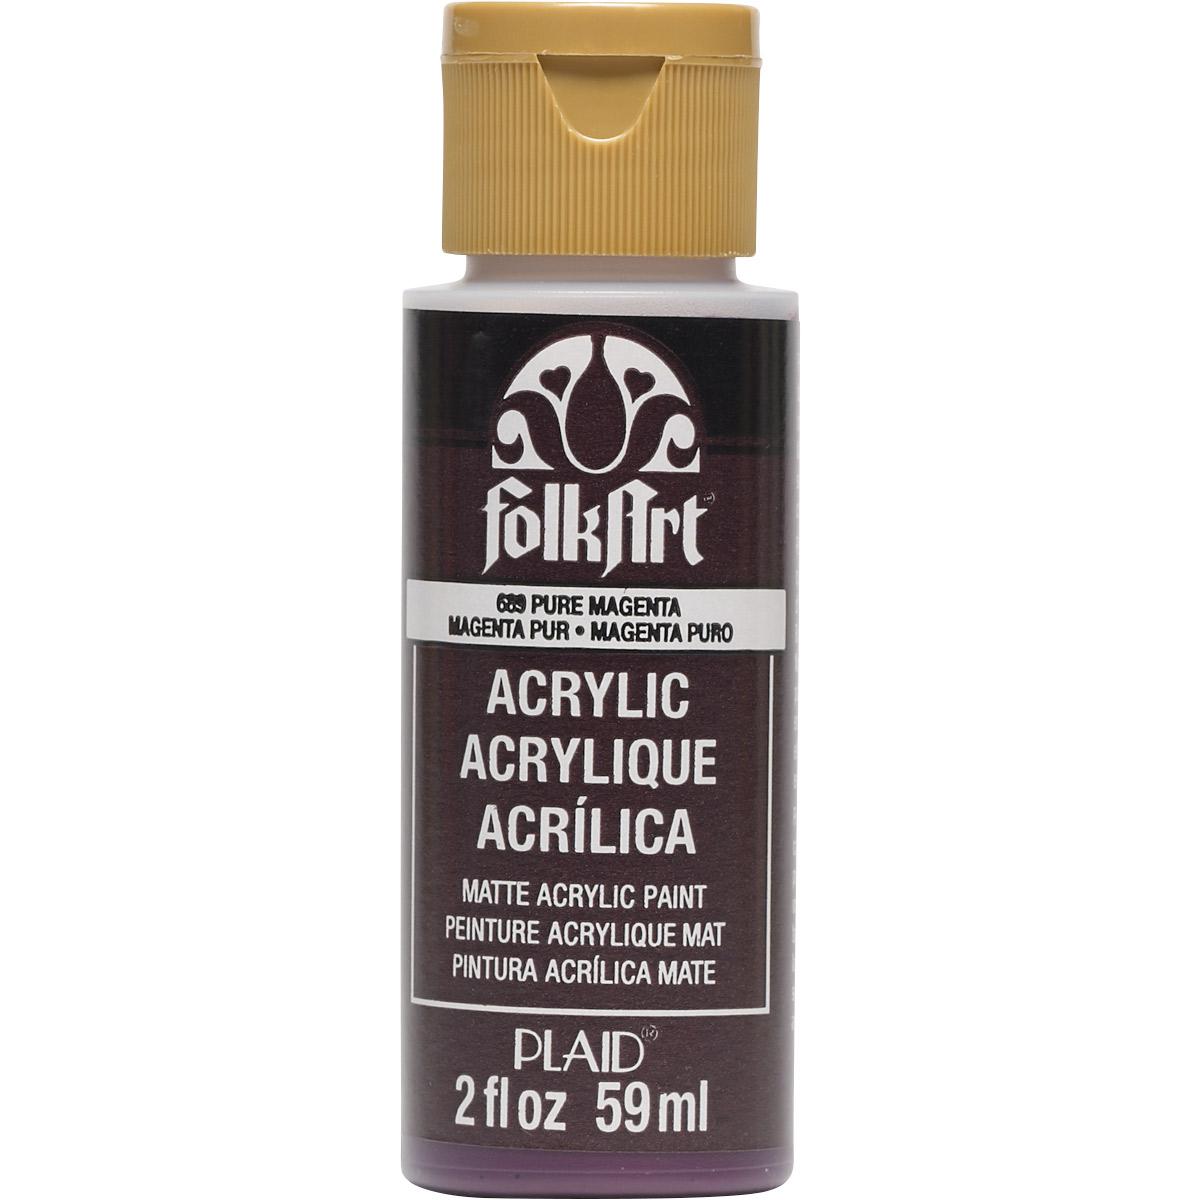 FolkArt ® Acrylic Colors - Pure Magenta, 2 oz. - 689